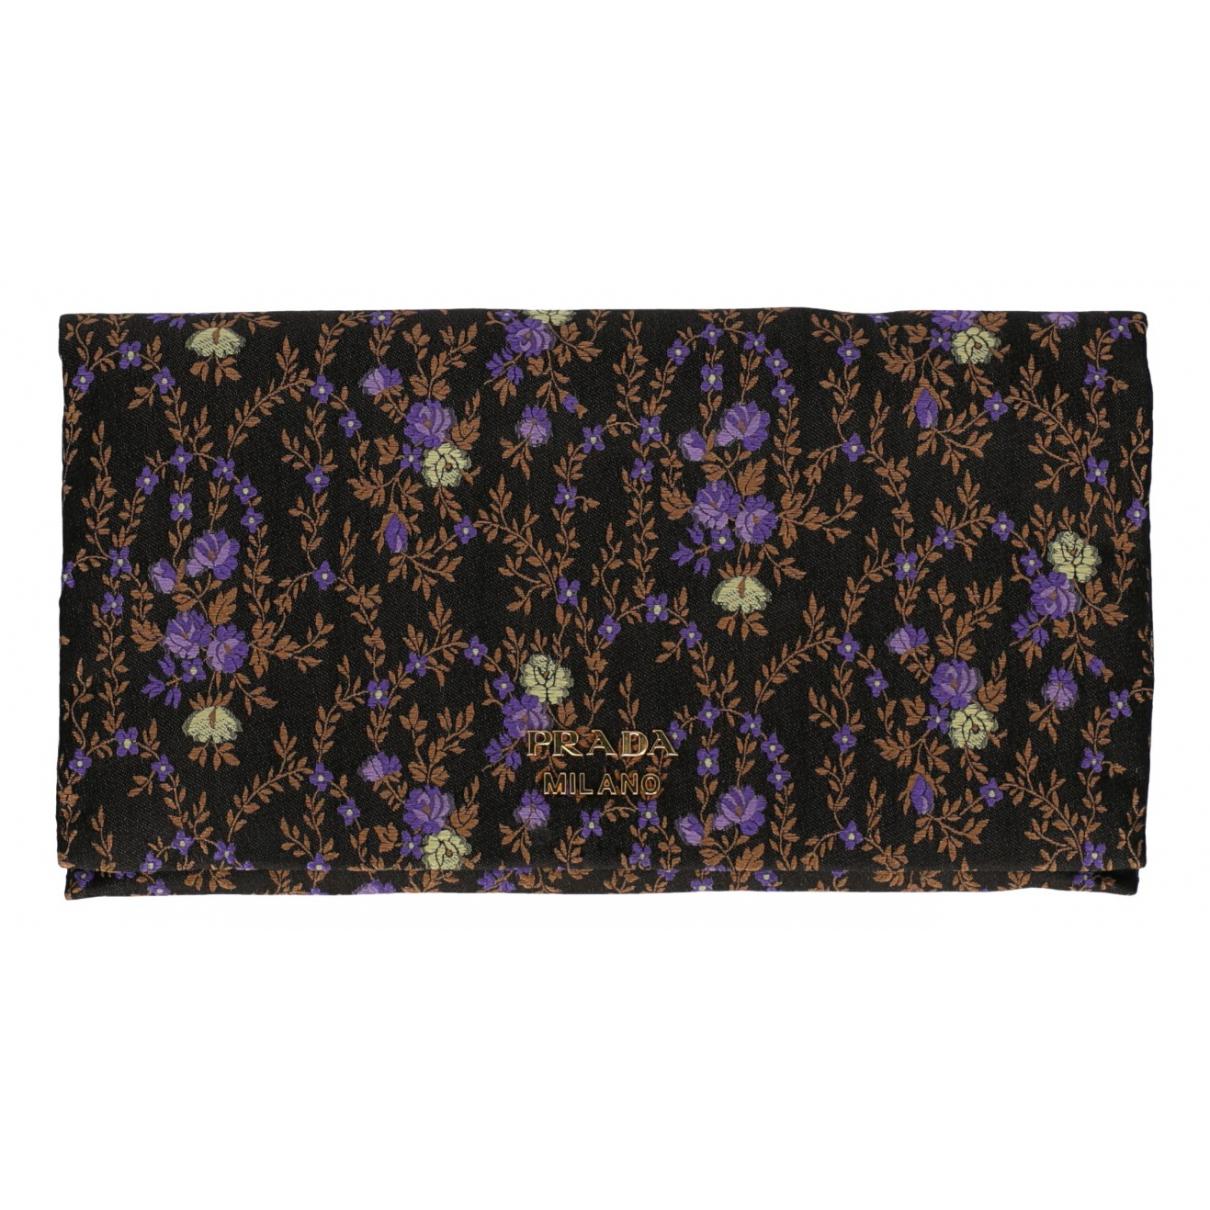 Prada N Black Cotton wallet for Women N